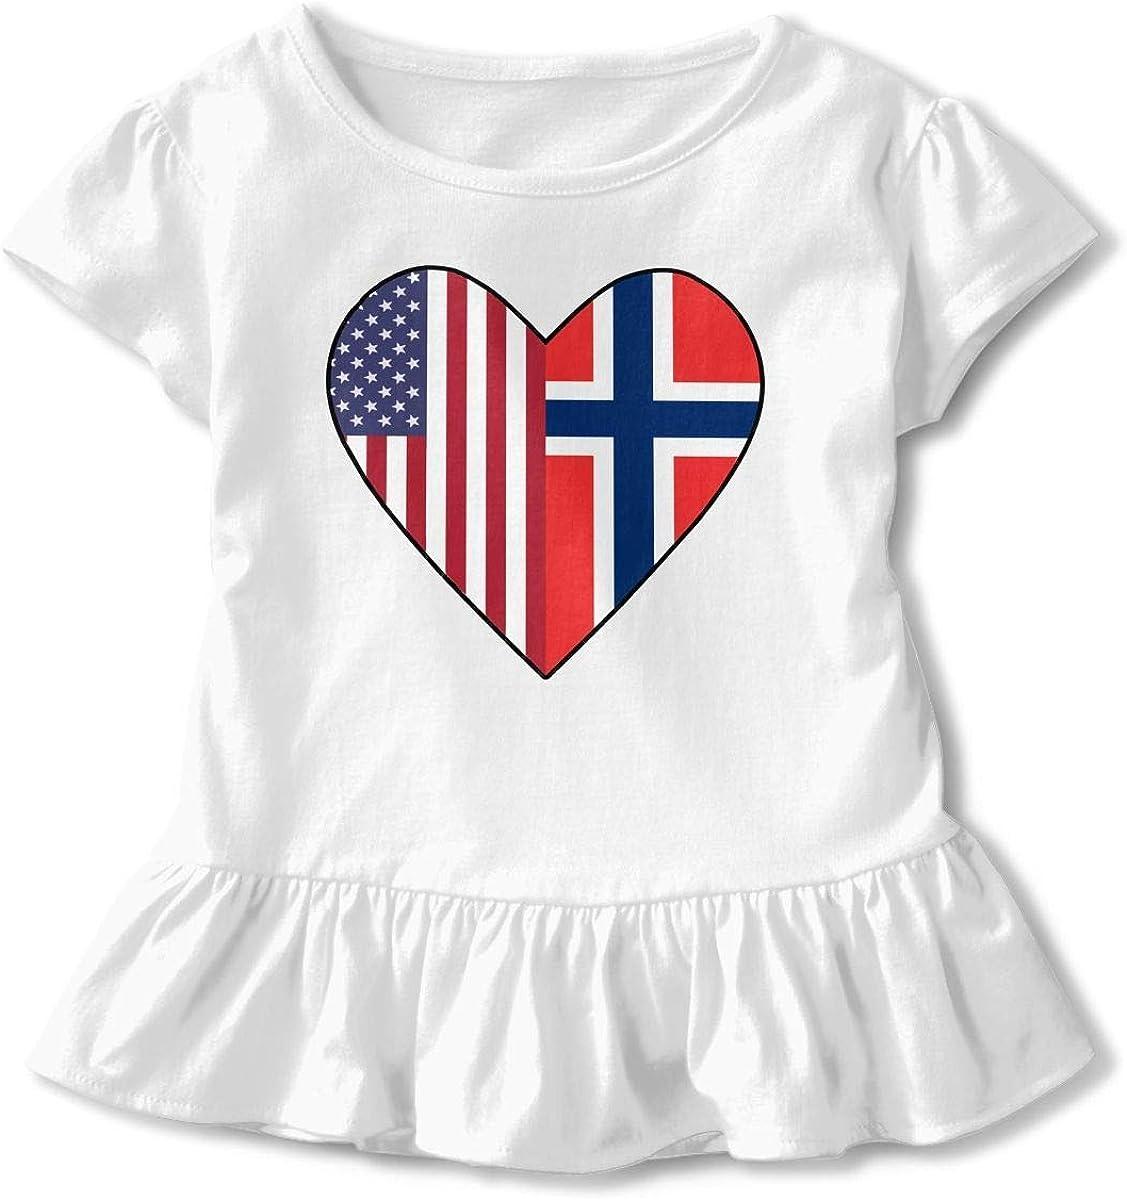 HelloWorlduk Toddler Baby Girl Eat Sleep Deutsch Repeat Funny Short Sleeve Cotton T Shirts Basic Tops Tee Clothes